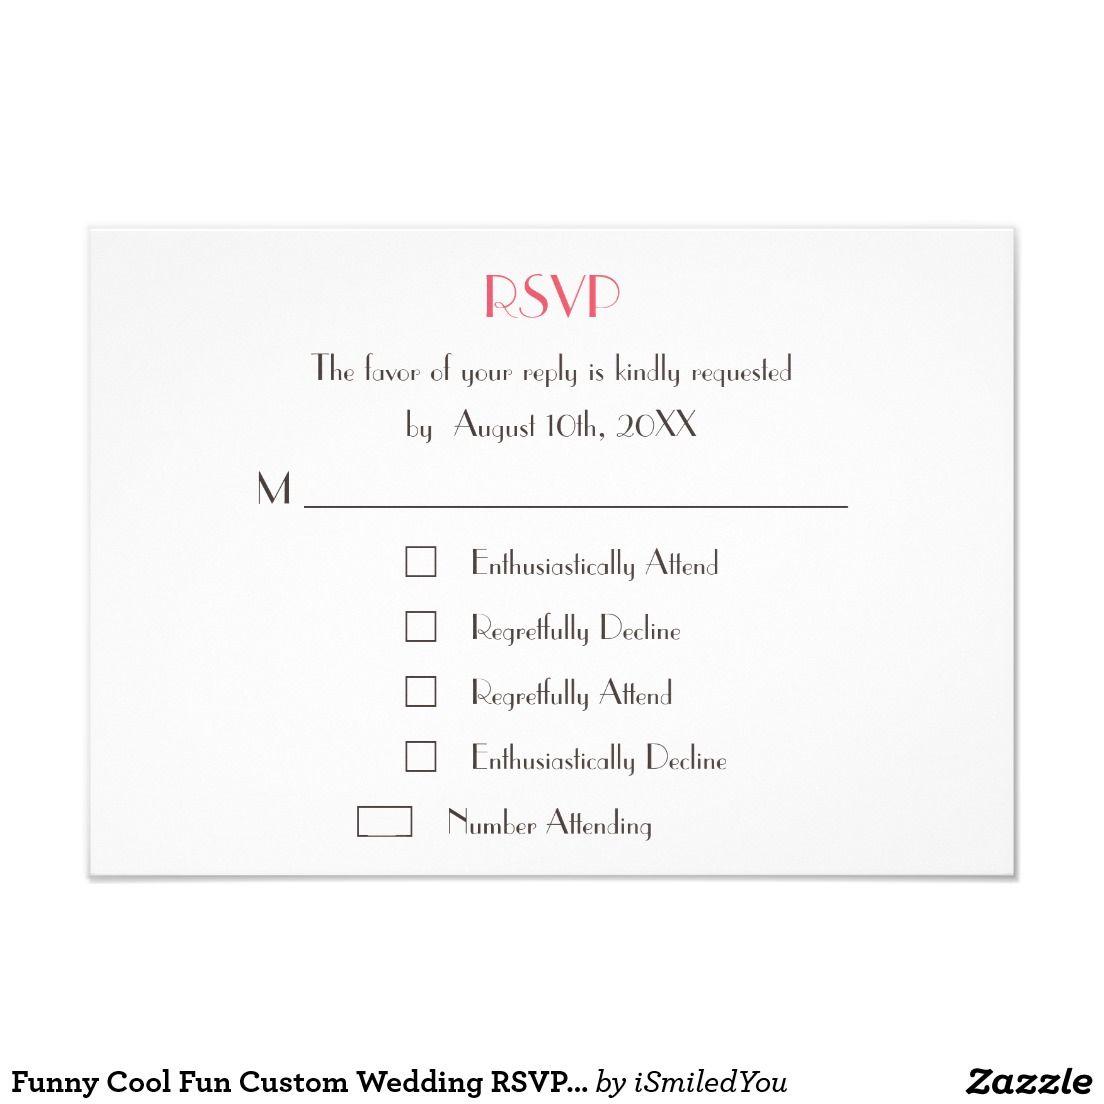 Pin By Anisha On Wedding Invites Simple In 2019: Funny Modern Custom Wedding White RSVP Card Invite